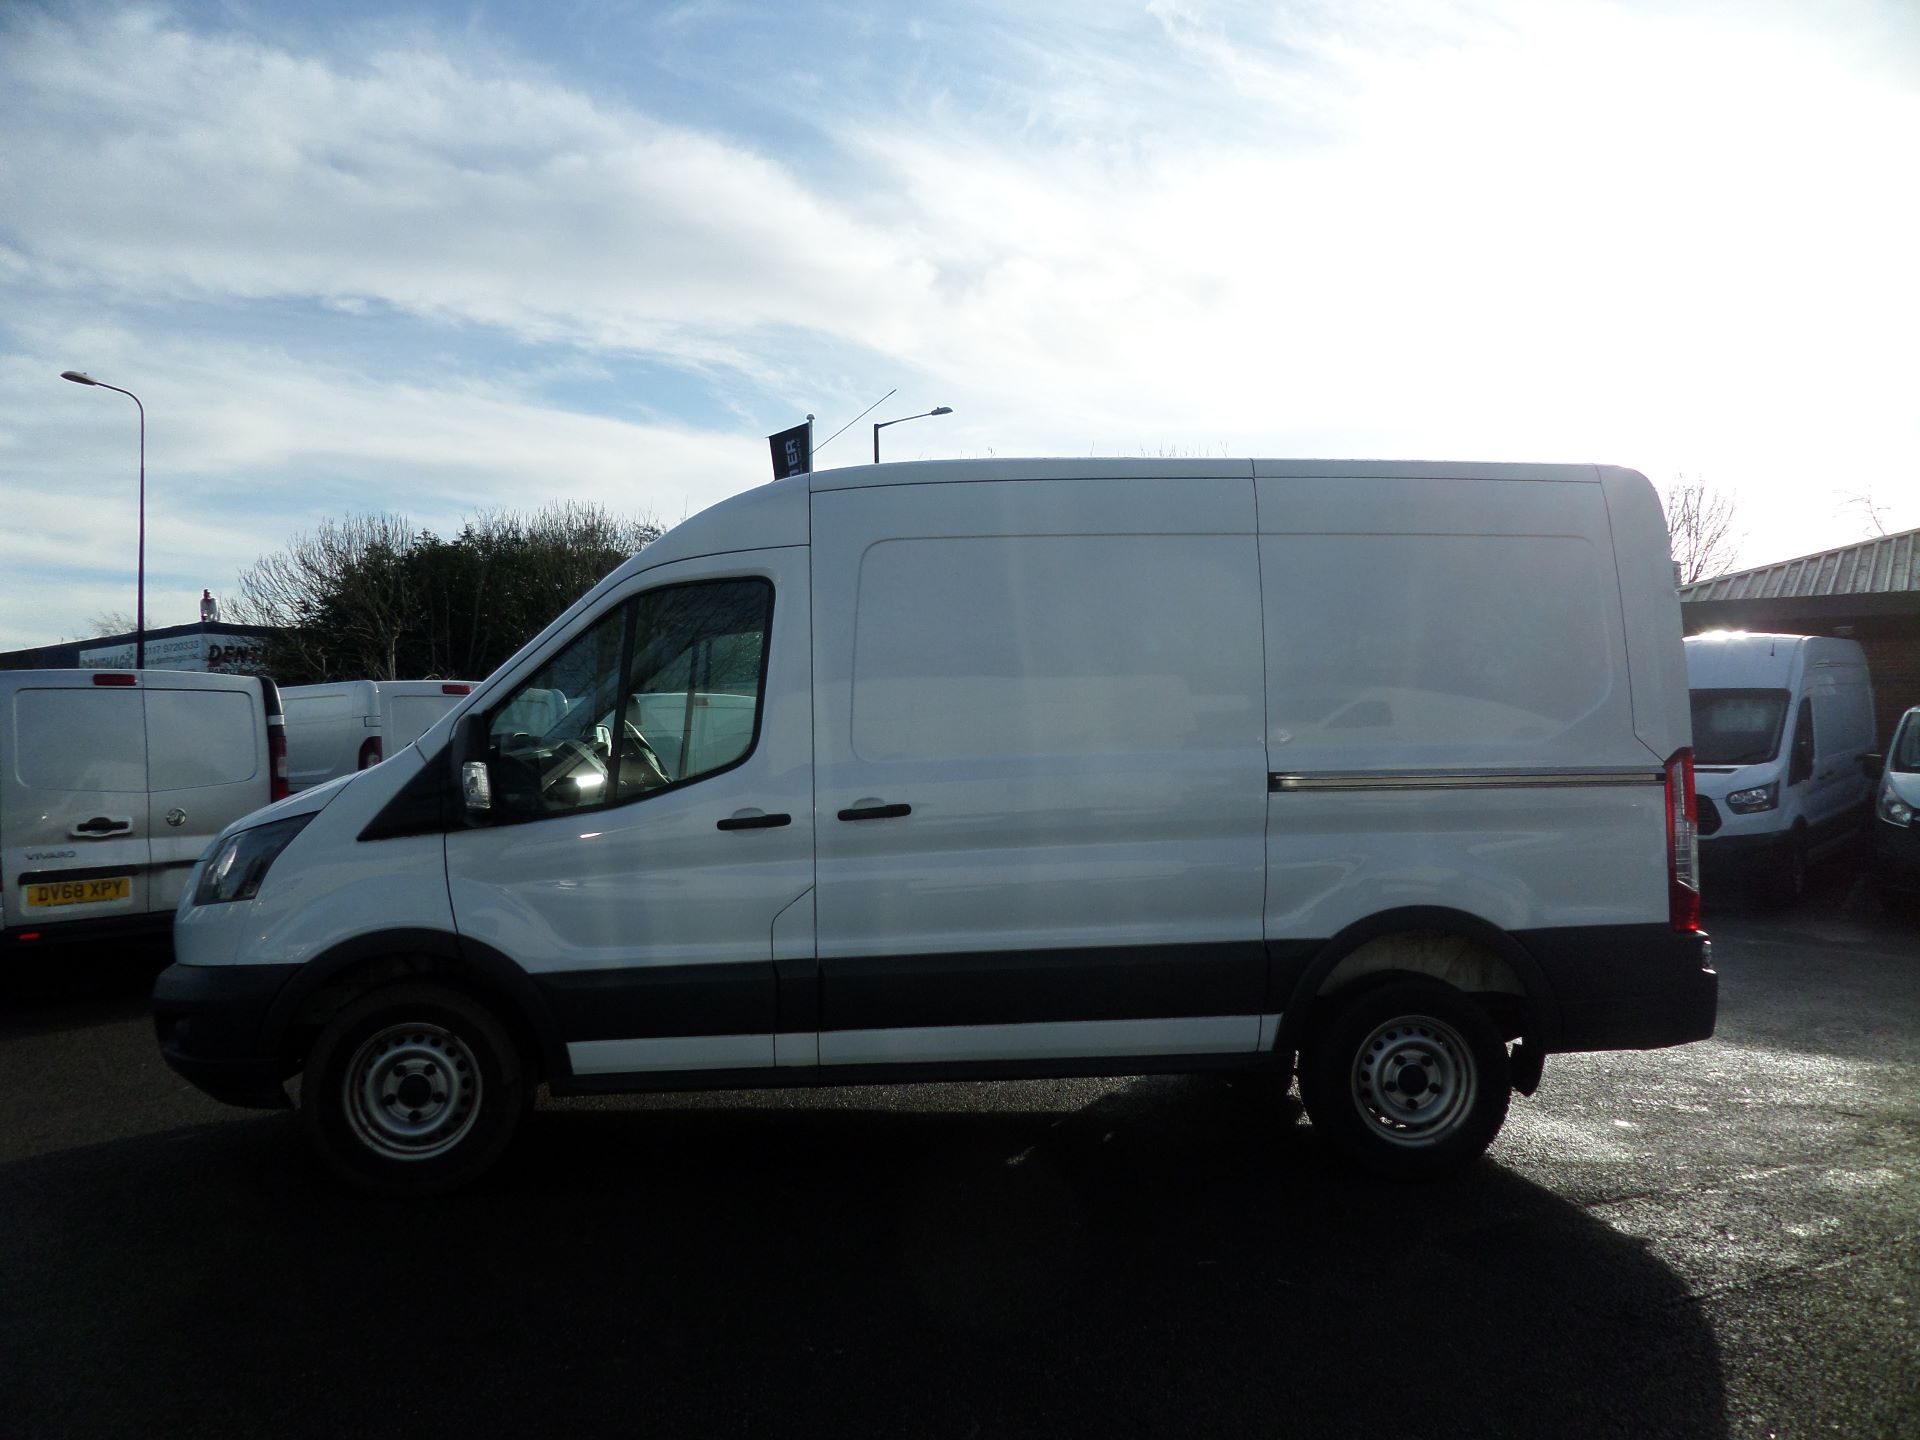 2018 Ford Transit 2.0 Tdci 130Ps H2/L2 Van Euro 6 (FE18JGO) Image 6